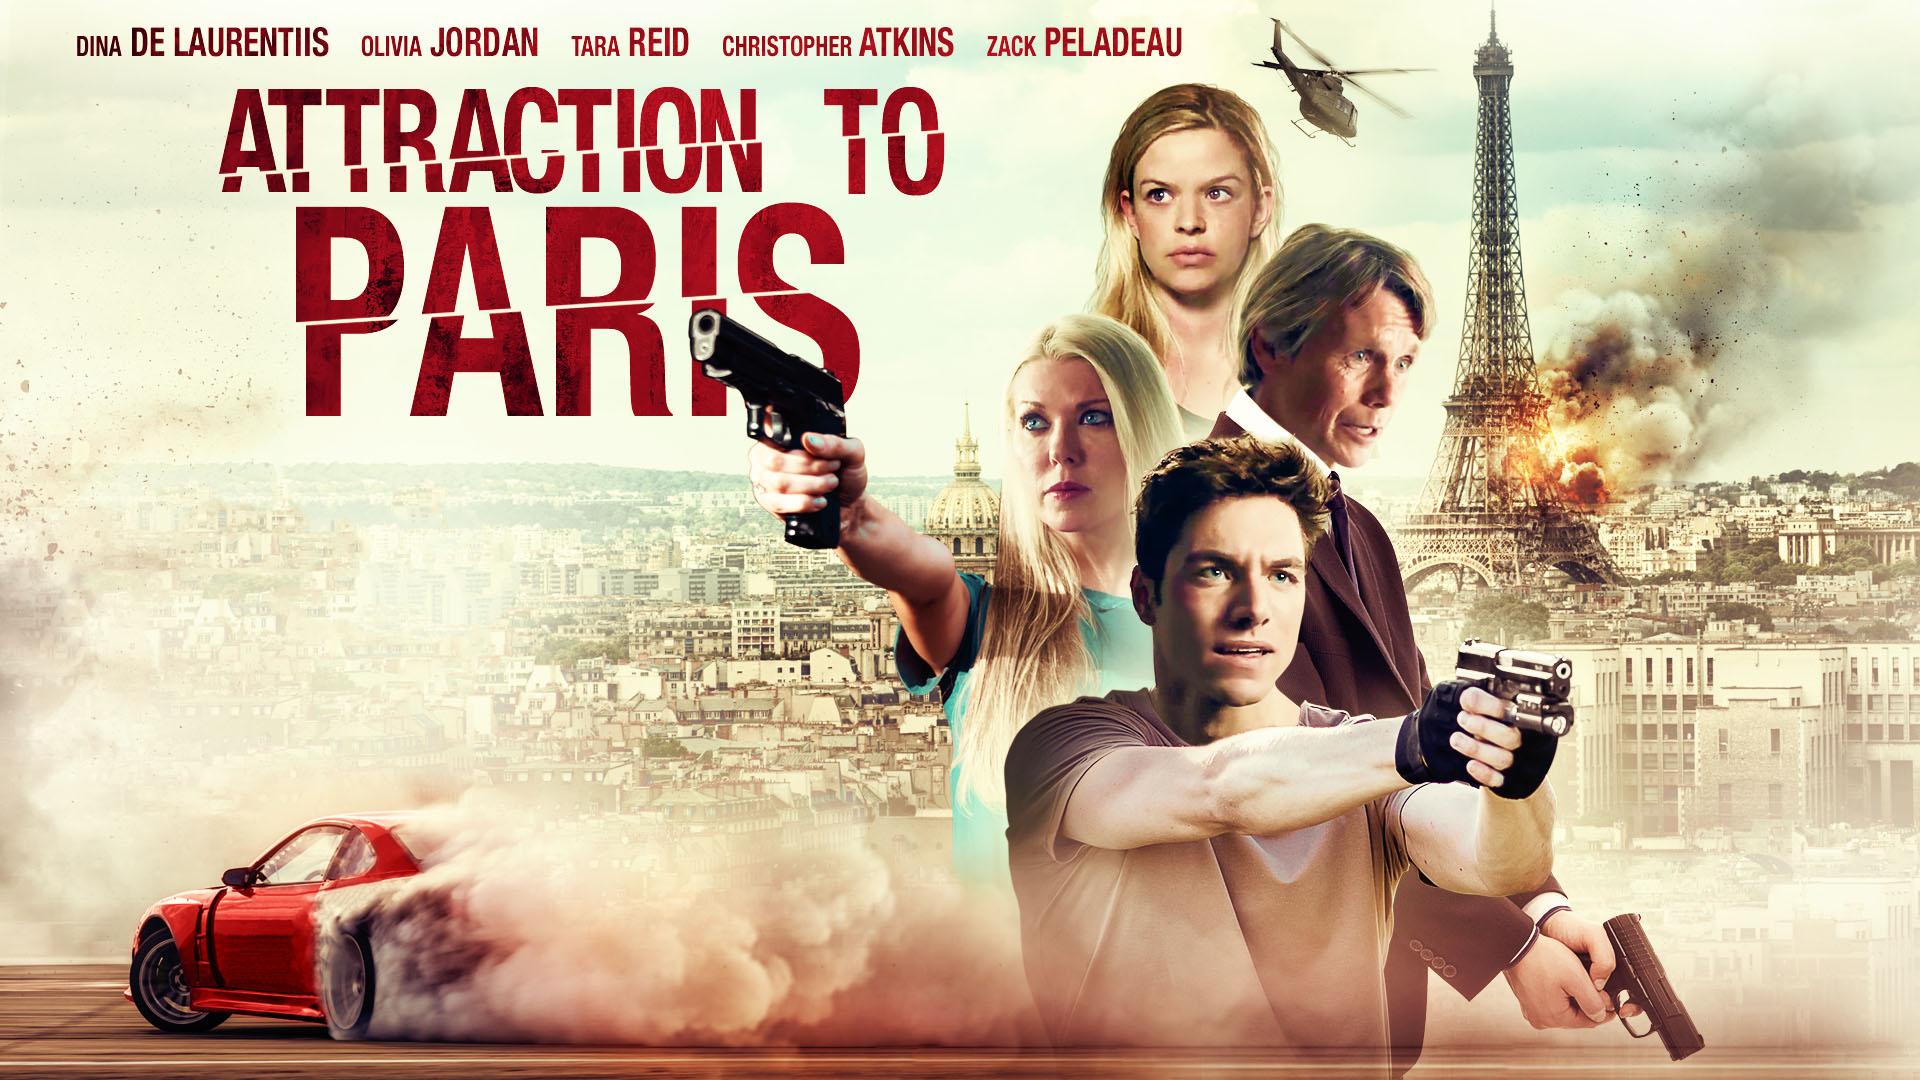 Attraction to Paris